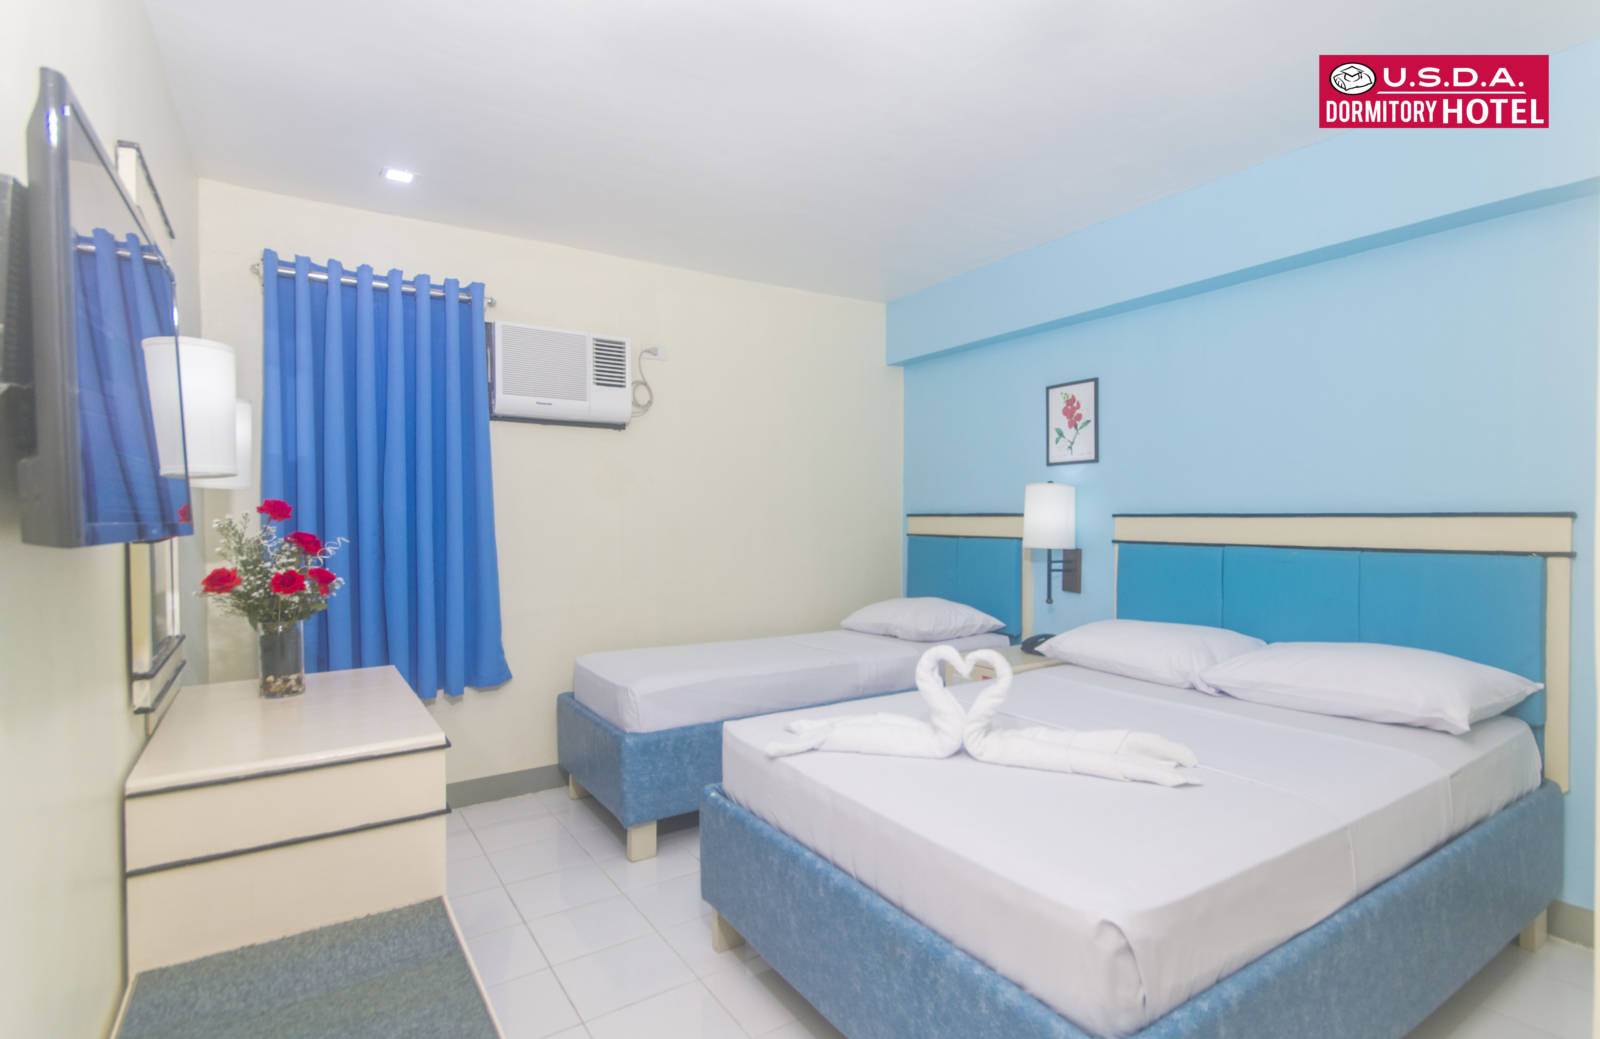 USDA Dormitory Hotel - Superior Room